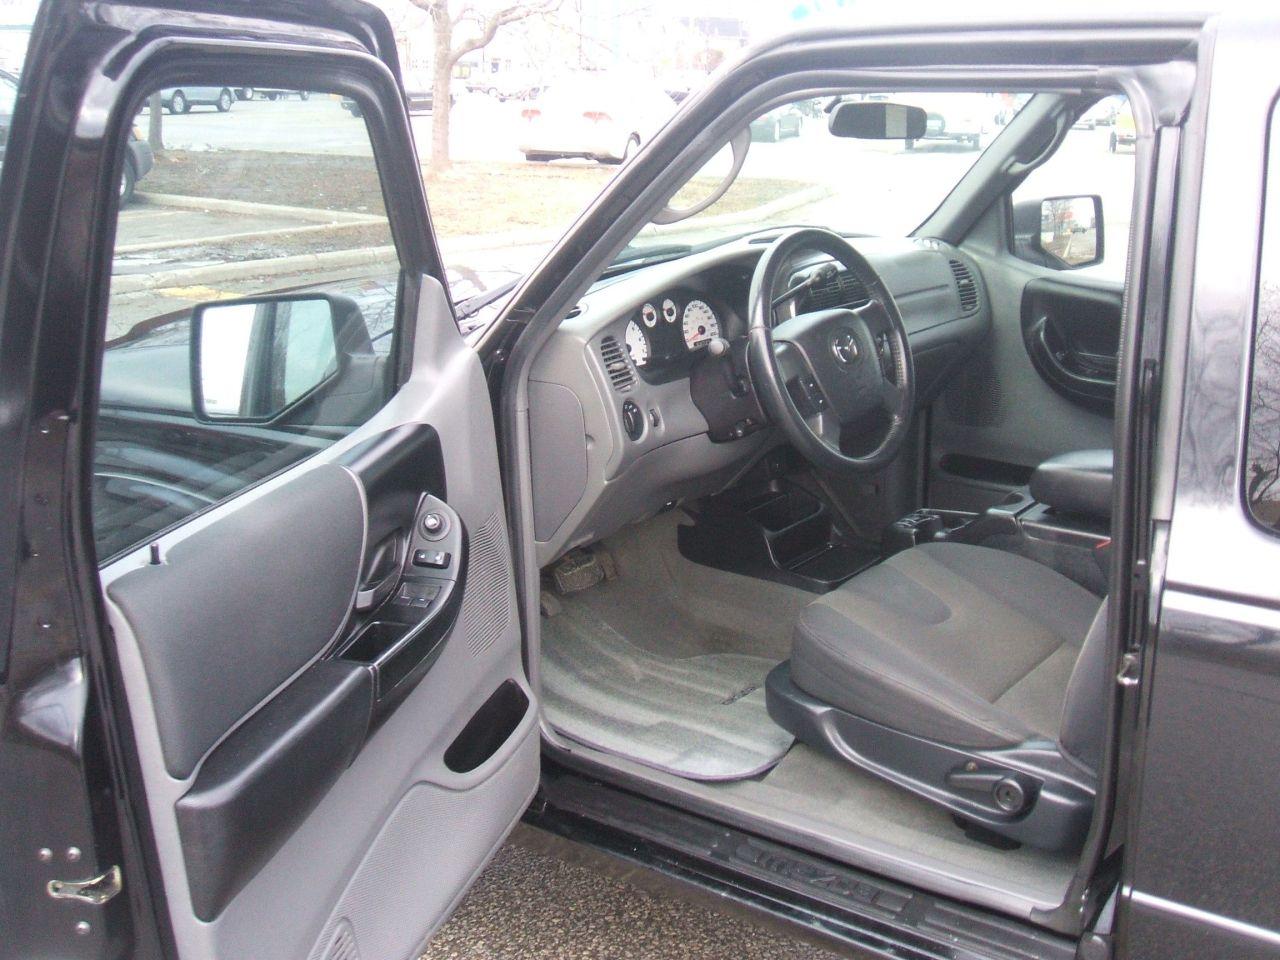 2010 Mazda B-Series